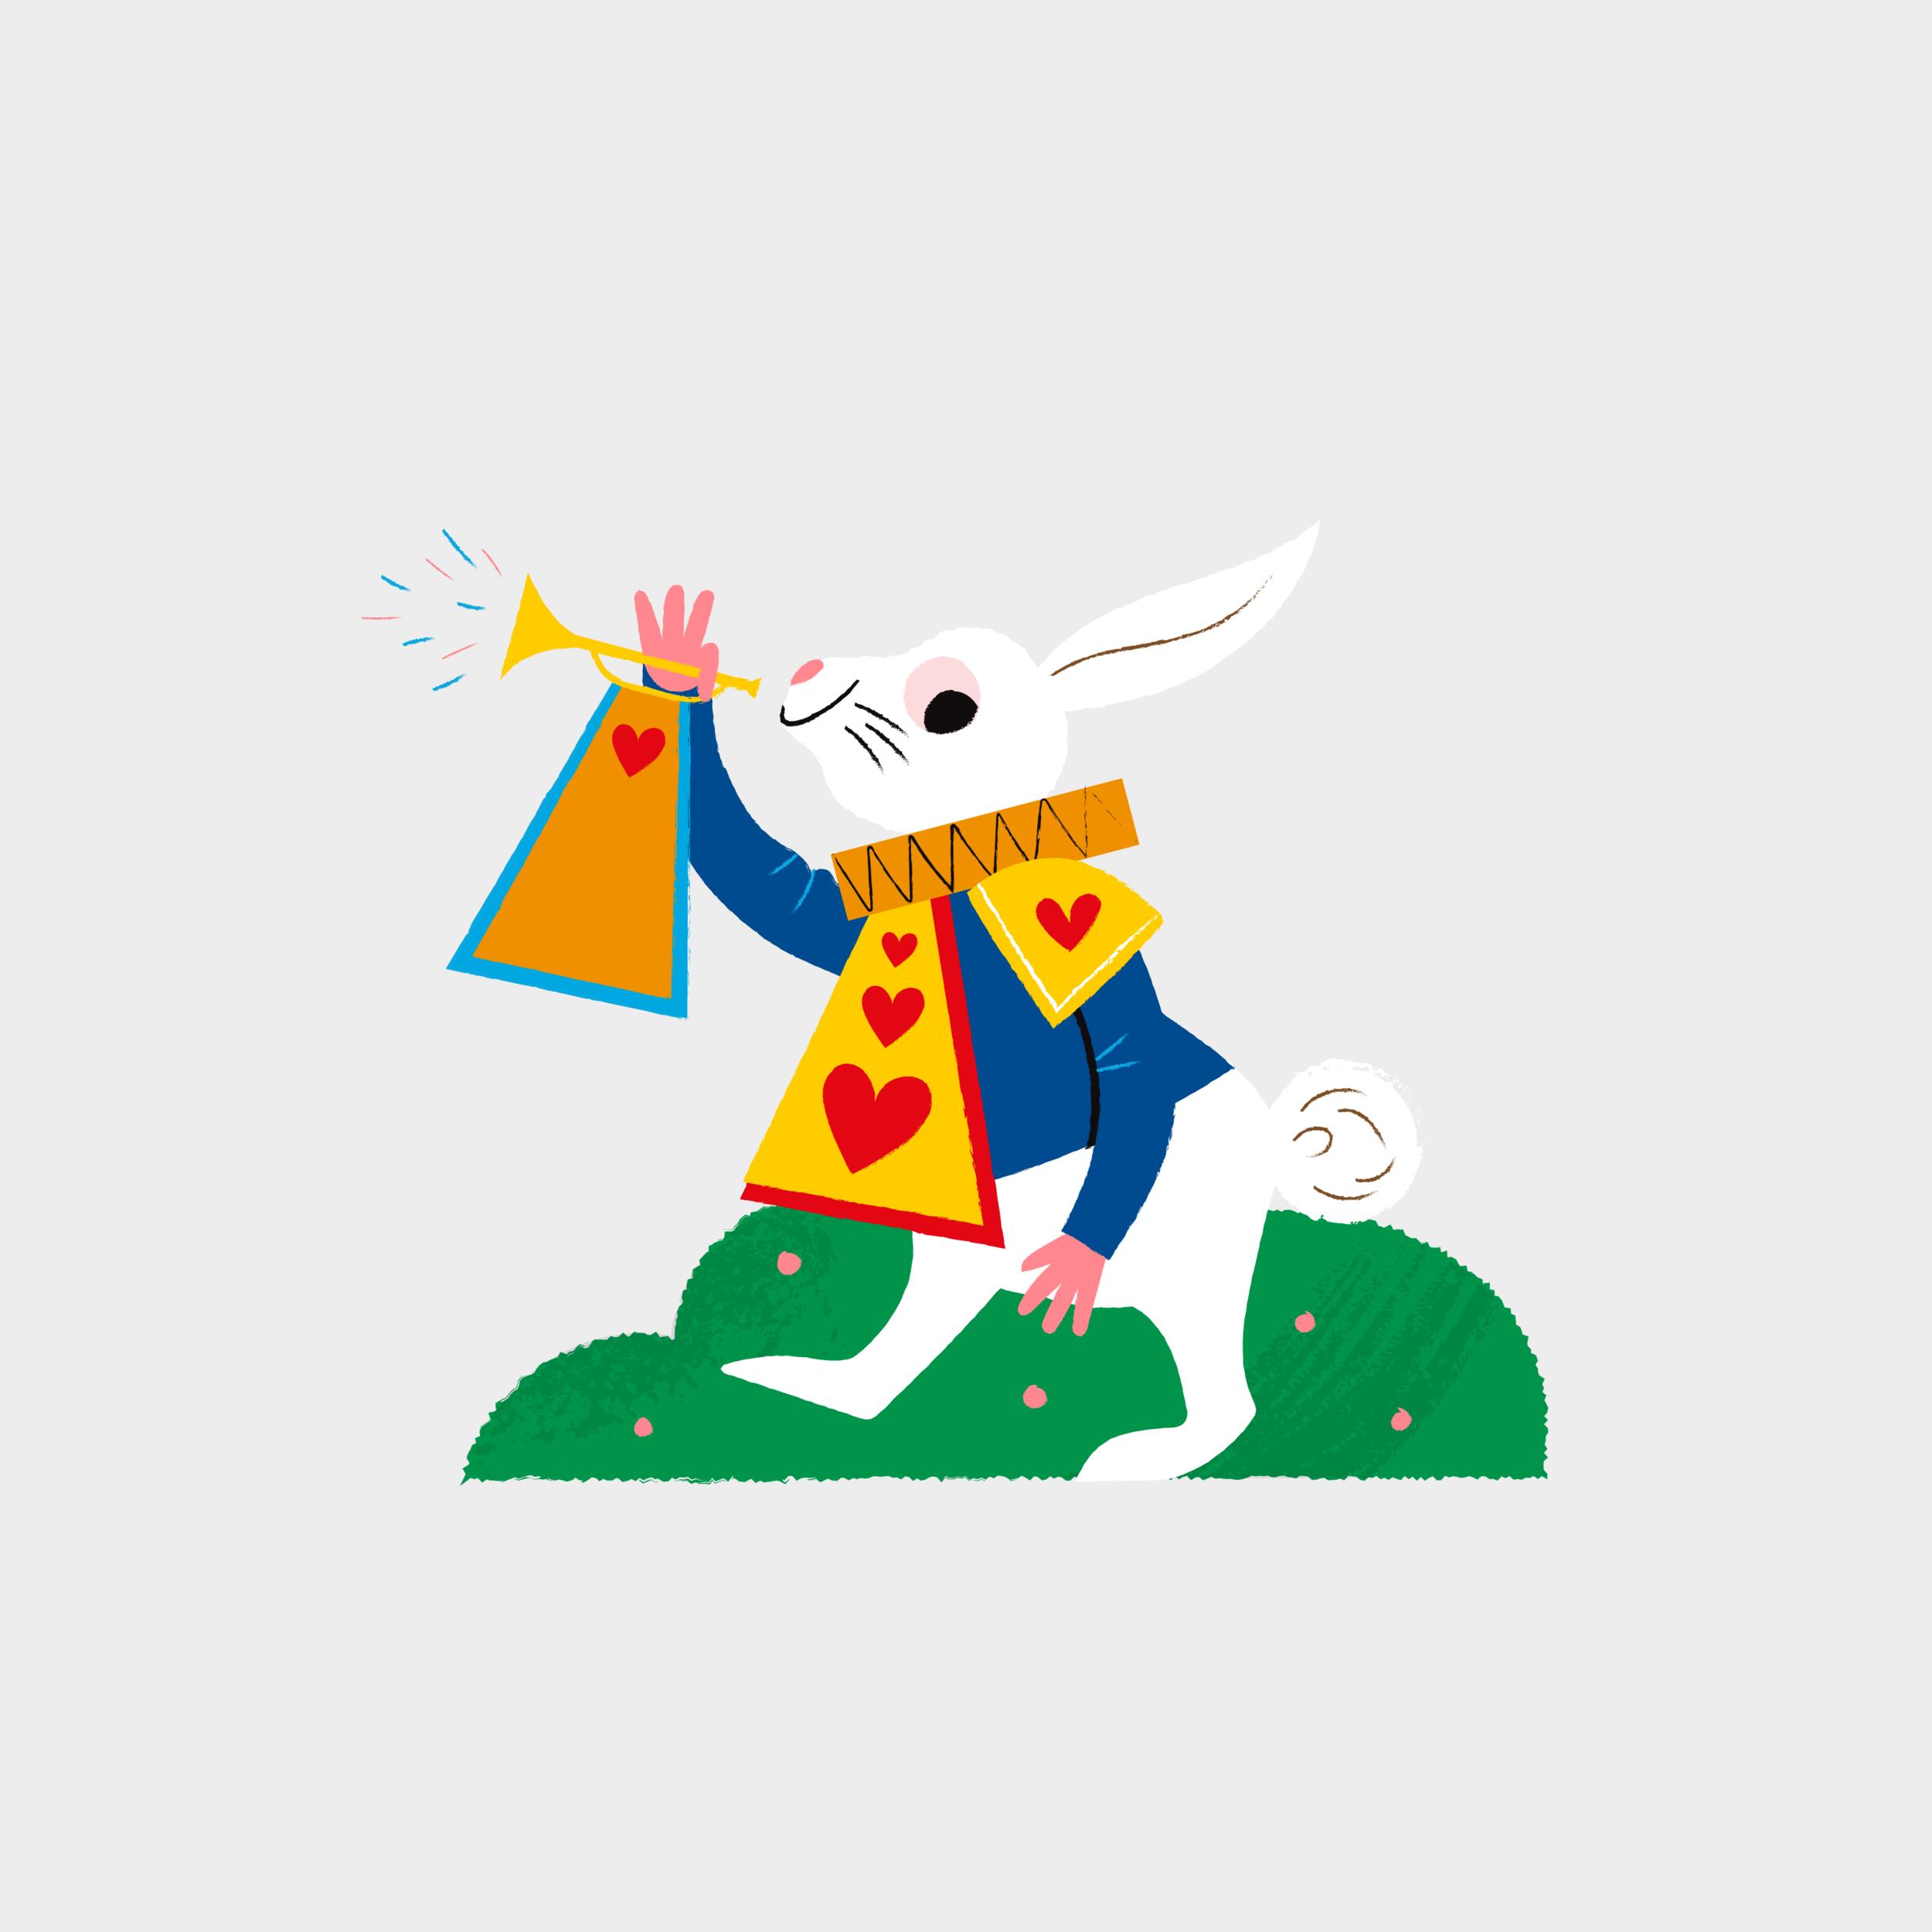 Rabbit@2x.png